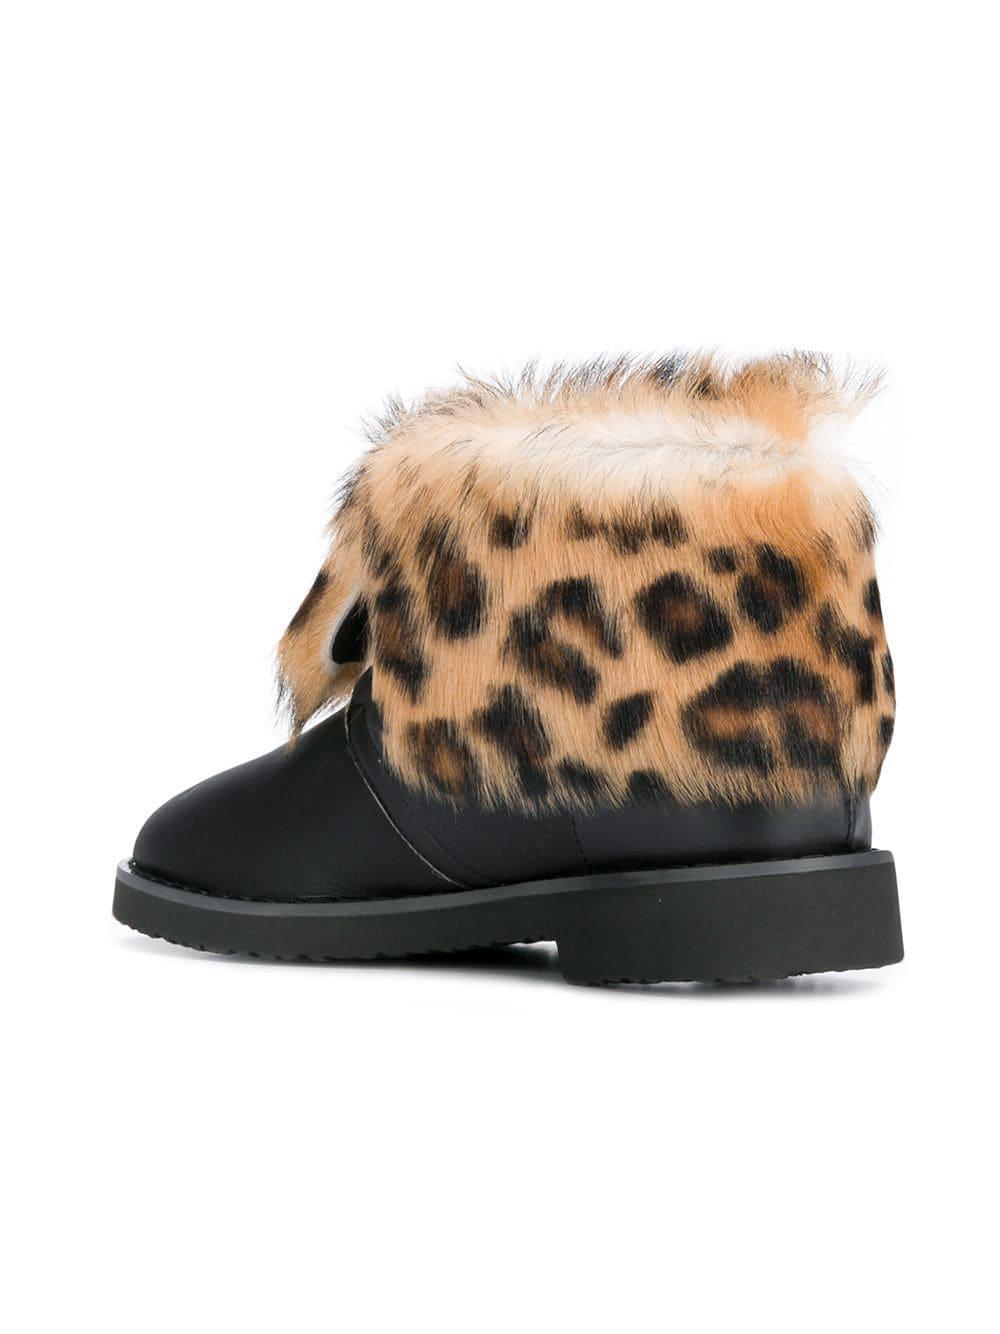 f2b18a01ec6a Lyst - Giuseppe Zanotti Leopard Ankle Boots in Black